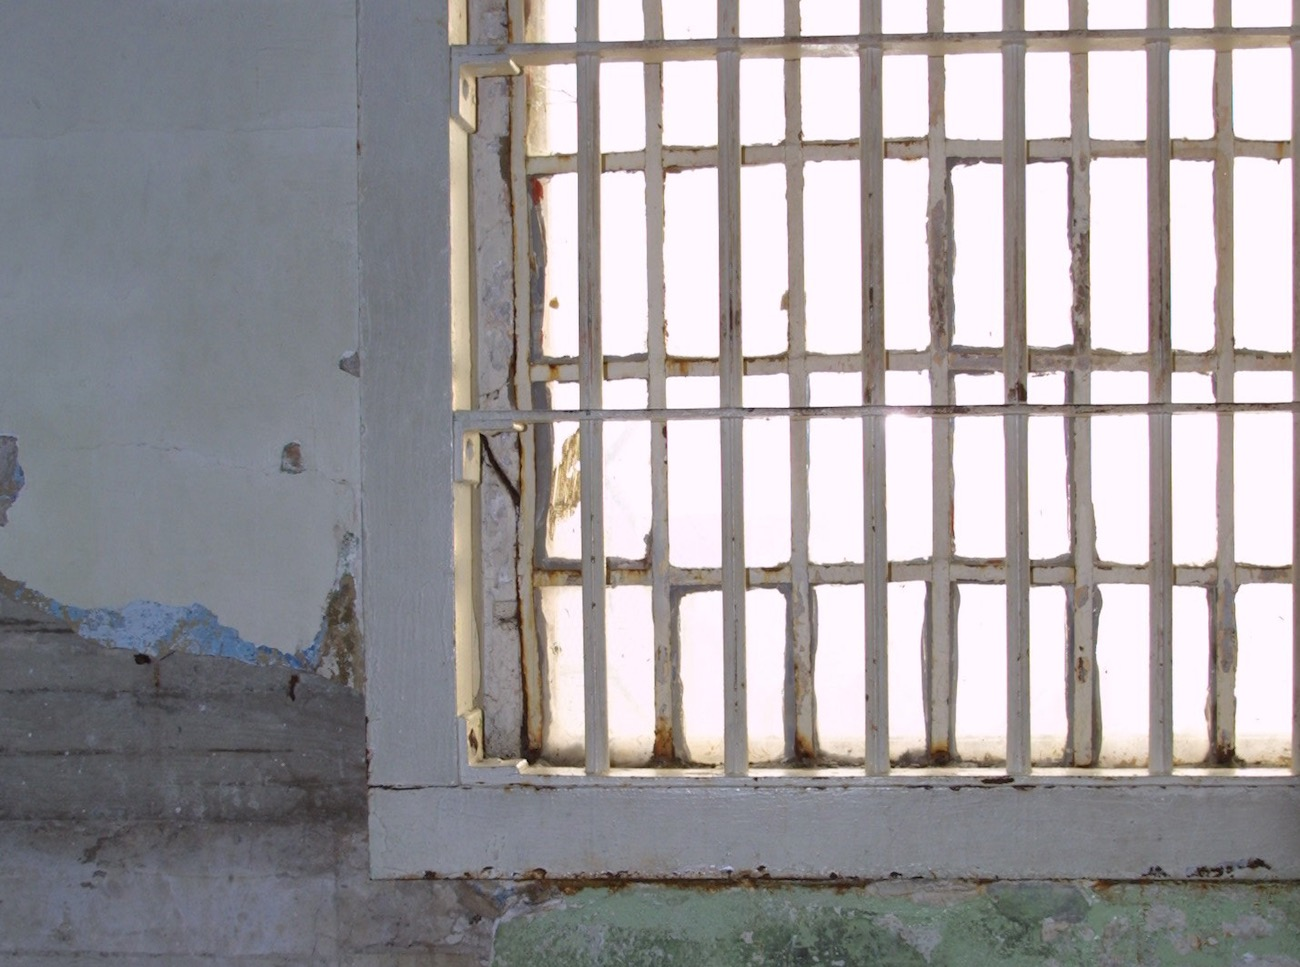 Alcatraz prison–Photo by Declan McCullagh